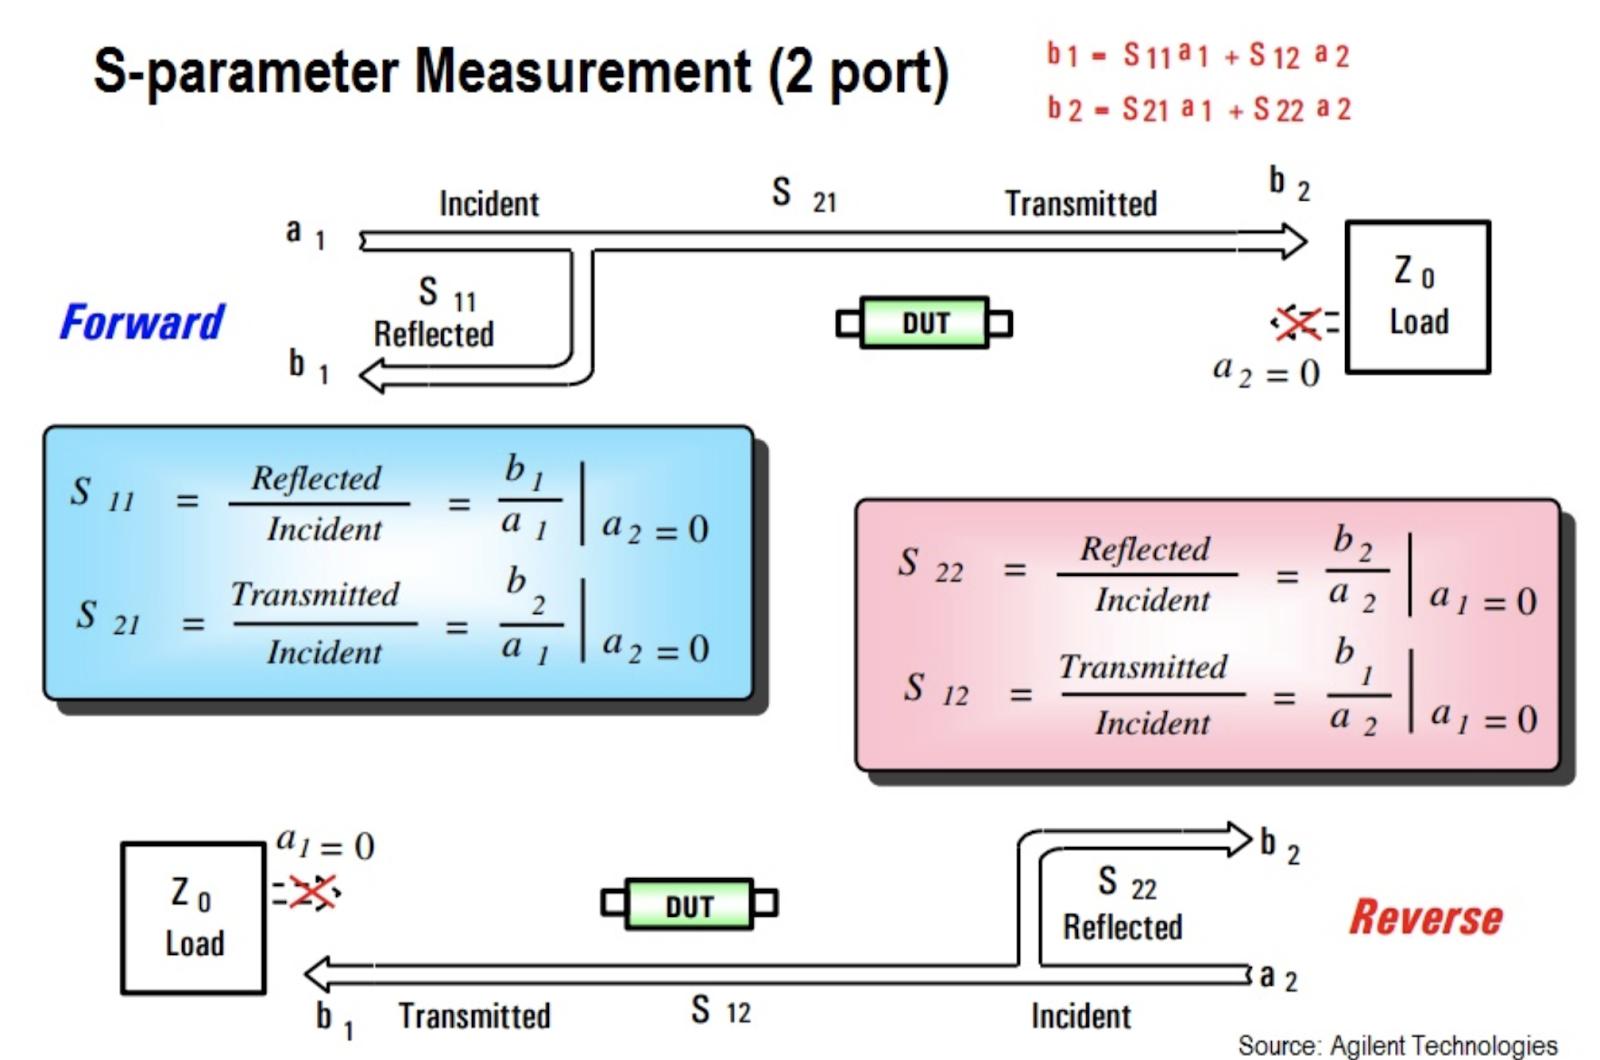 s-parameter